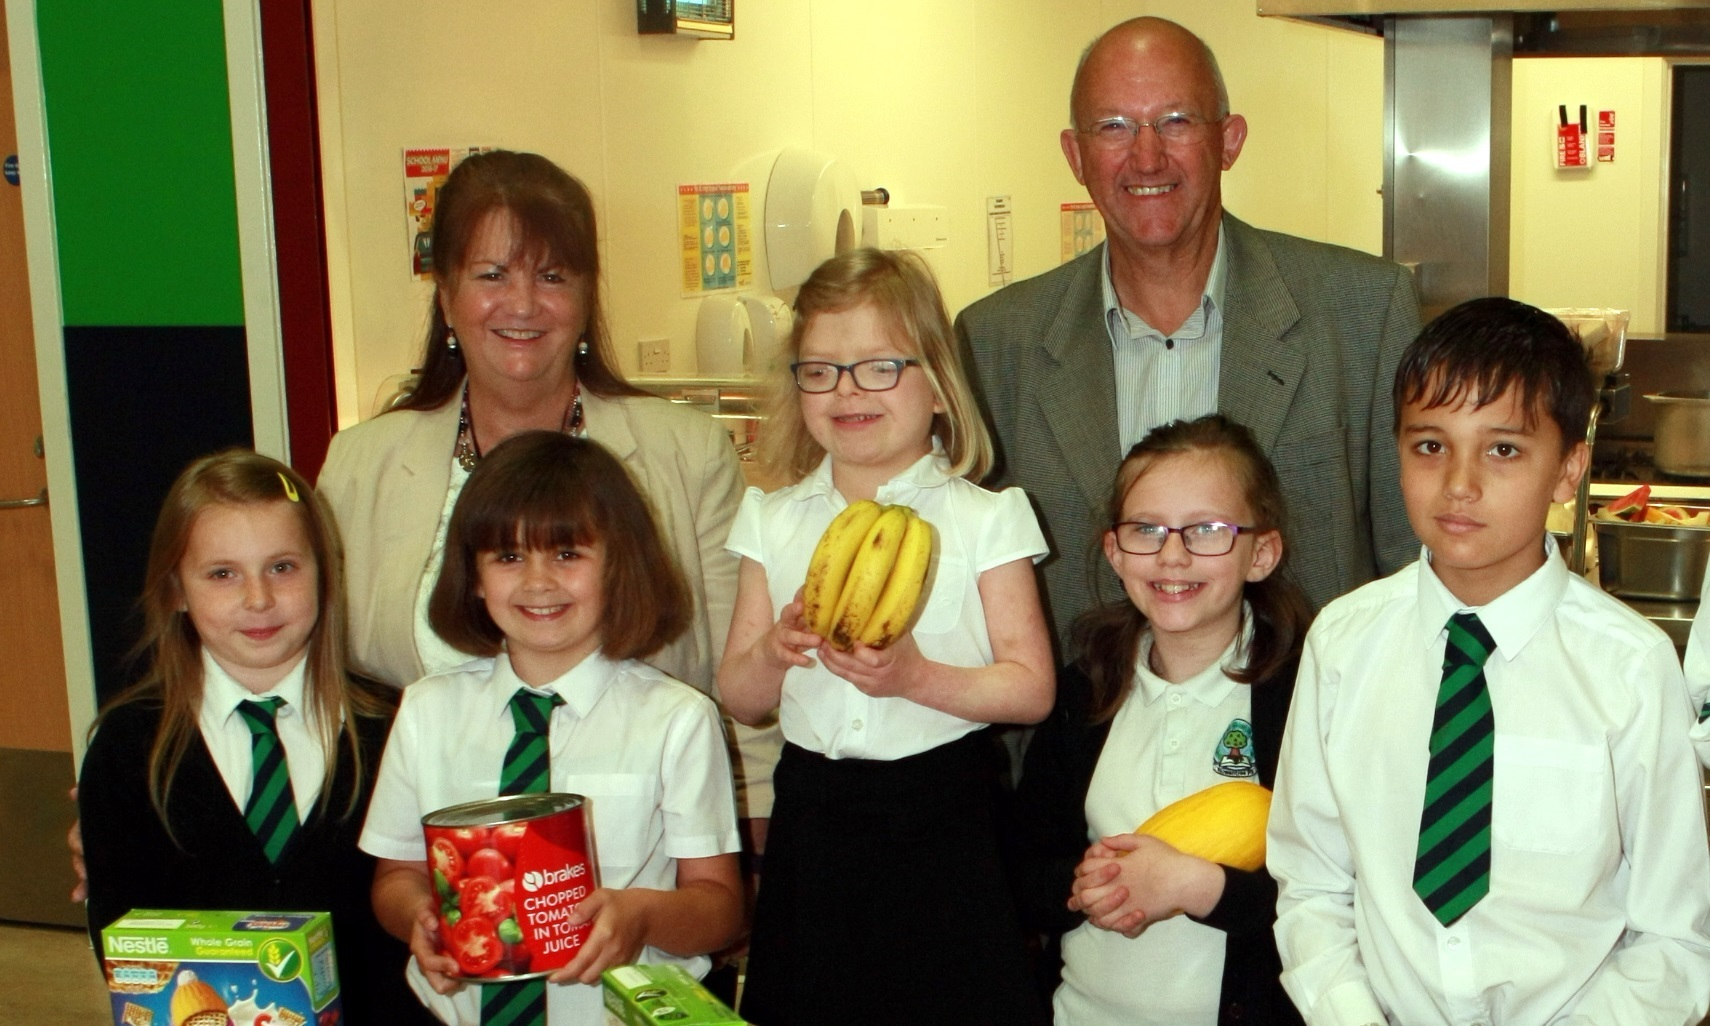 At Rowantree Primary are Holly Hawes, Kaya Jamieson, Ava Gibson, Abbie Kennedy and Michael Wilson. At the back is head teacher Emily O'Neill and Dundee Fun & Food co-ordinator David Dorward.